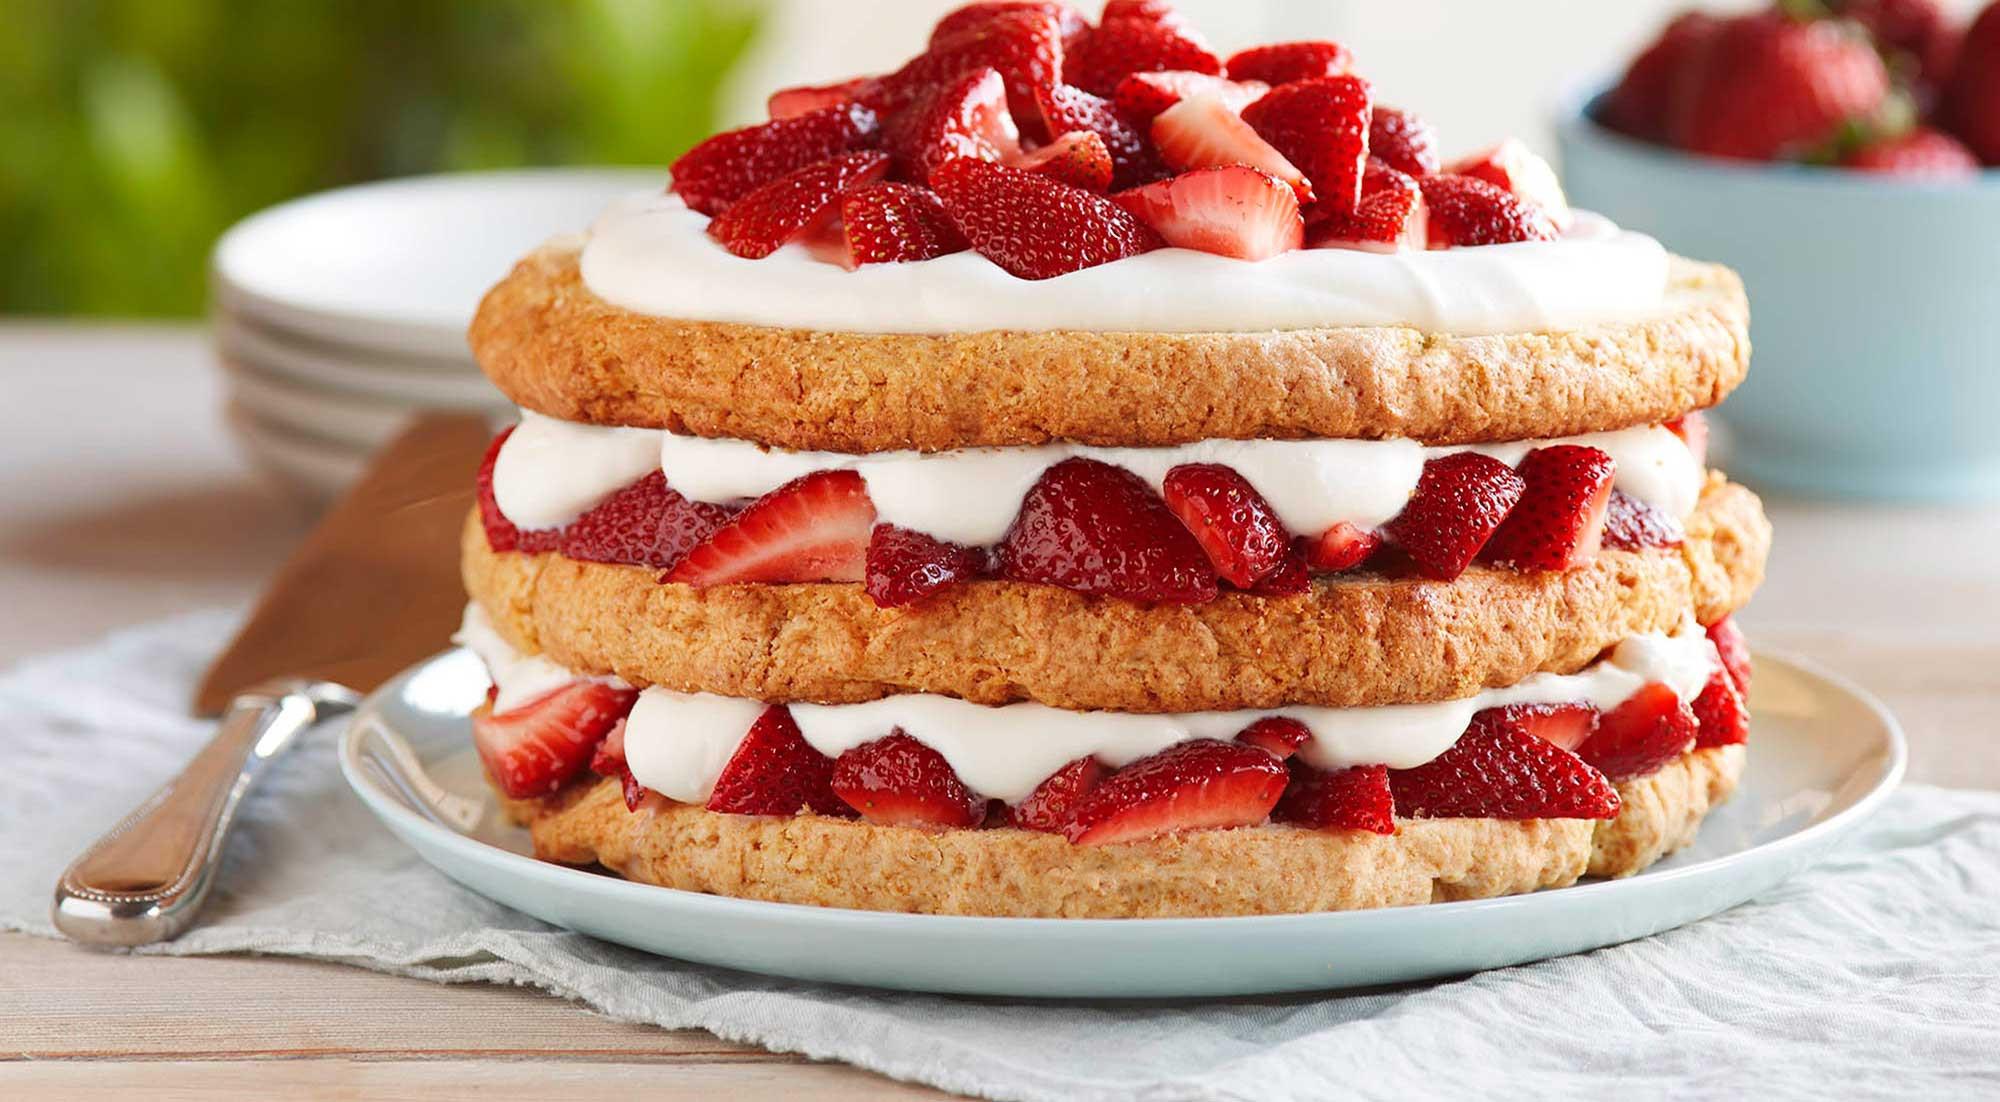 Healthy Strawberry Shortcake  Strawberry Shortcake Recipe